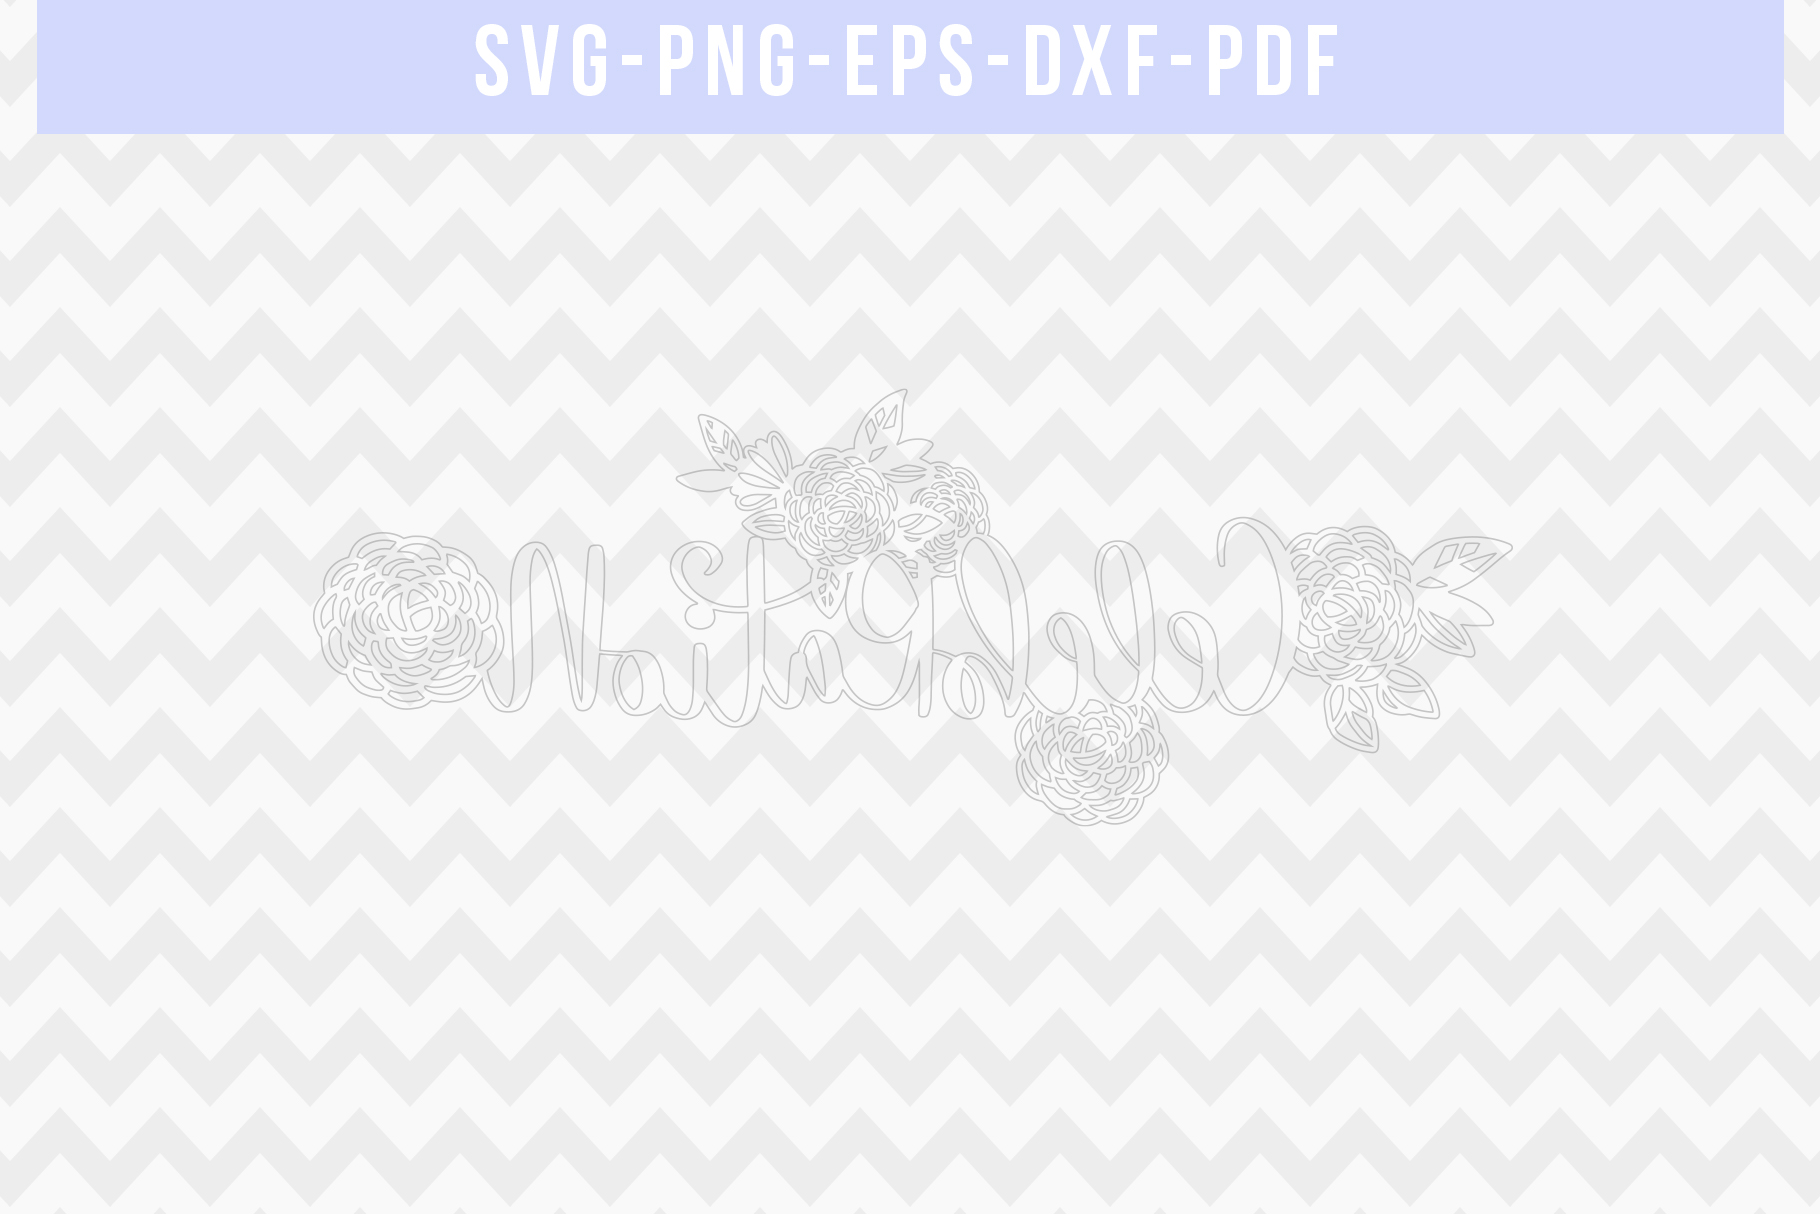 Celebration Papercut Template, Wedding Invitation SVG, PDF example image 2